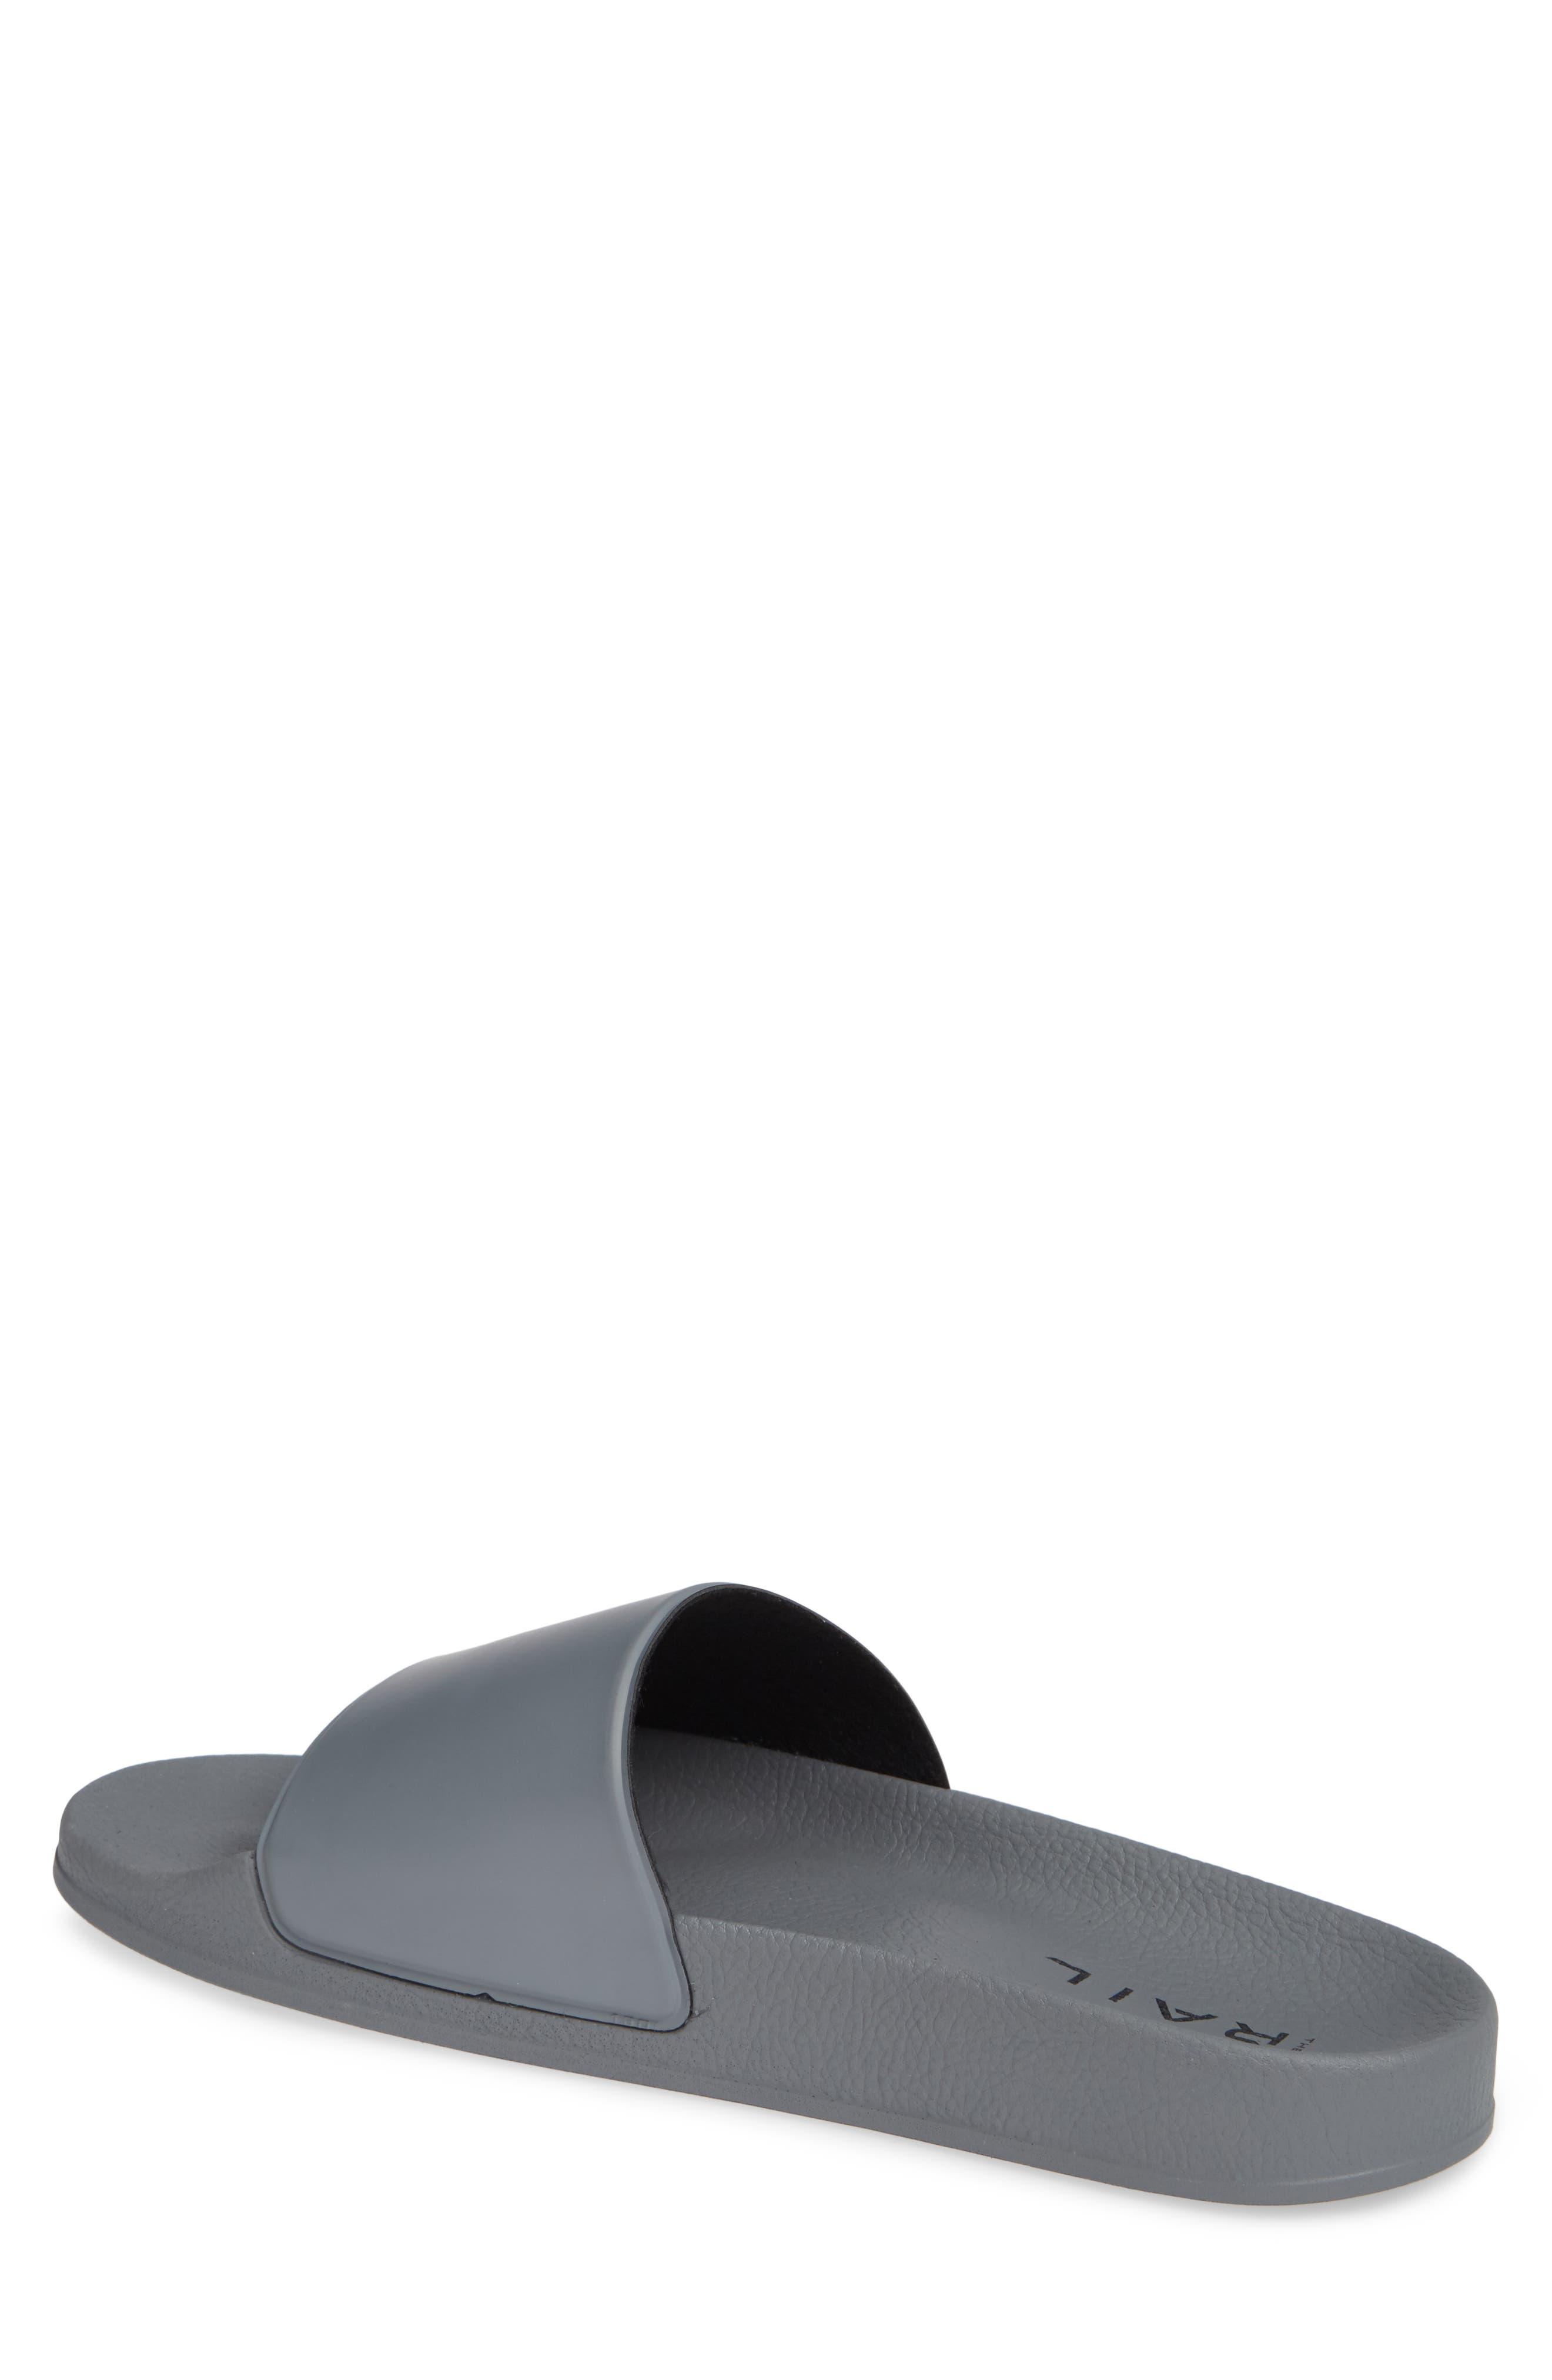 Bondi Slide Sandal,                             Alternate thumbnail 2, color,                             GREY